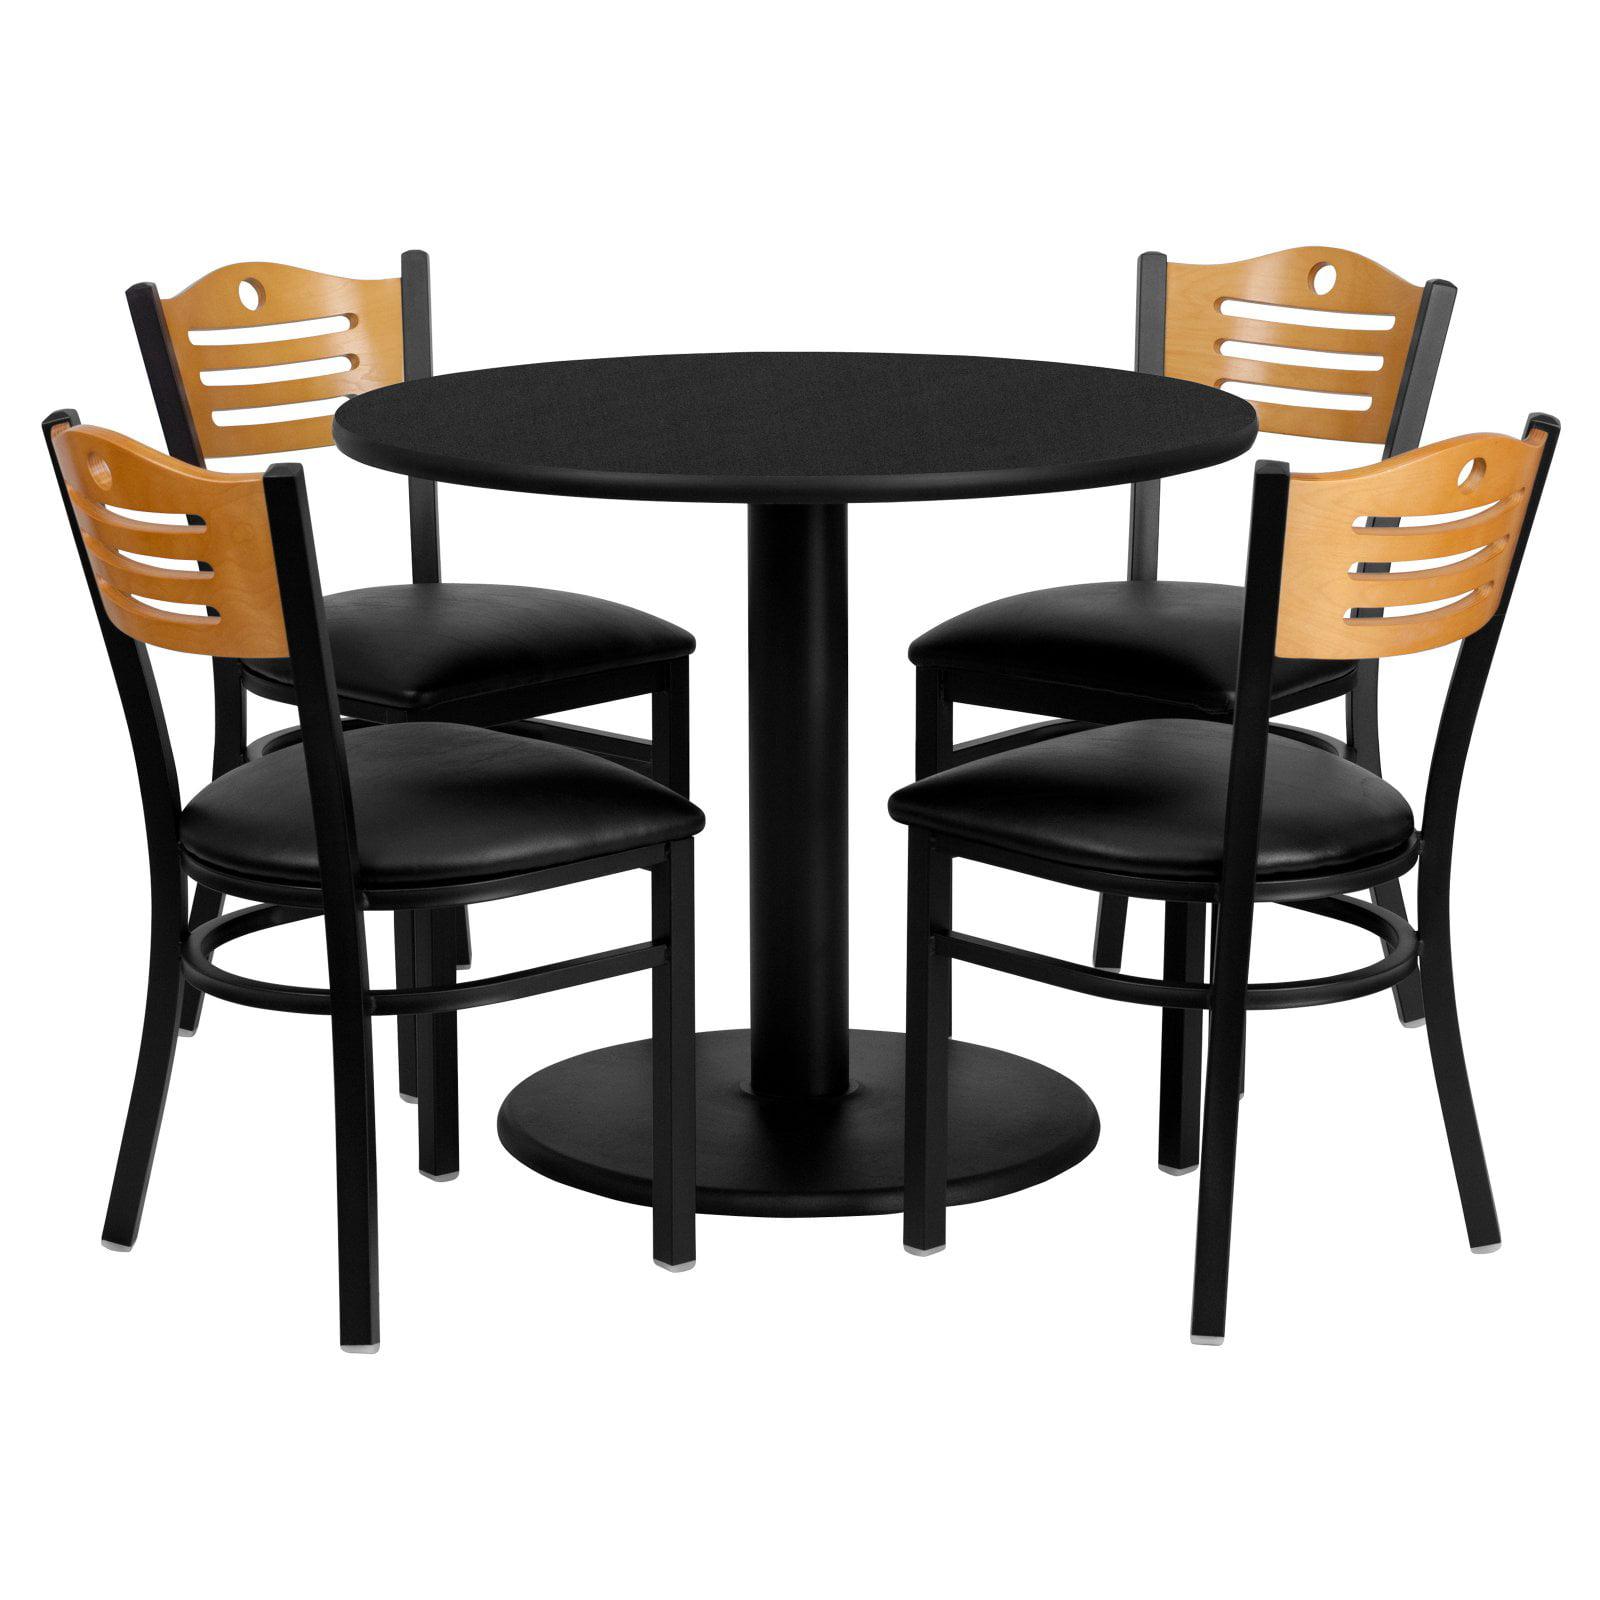 Flash Furniture 36'' Round Black Laminate Table Set with 4 Wood Slat Back Metal Chairs, Black Vinyl Seat